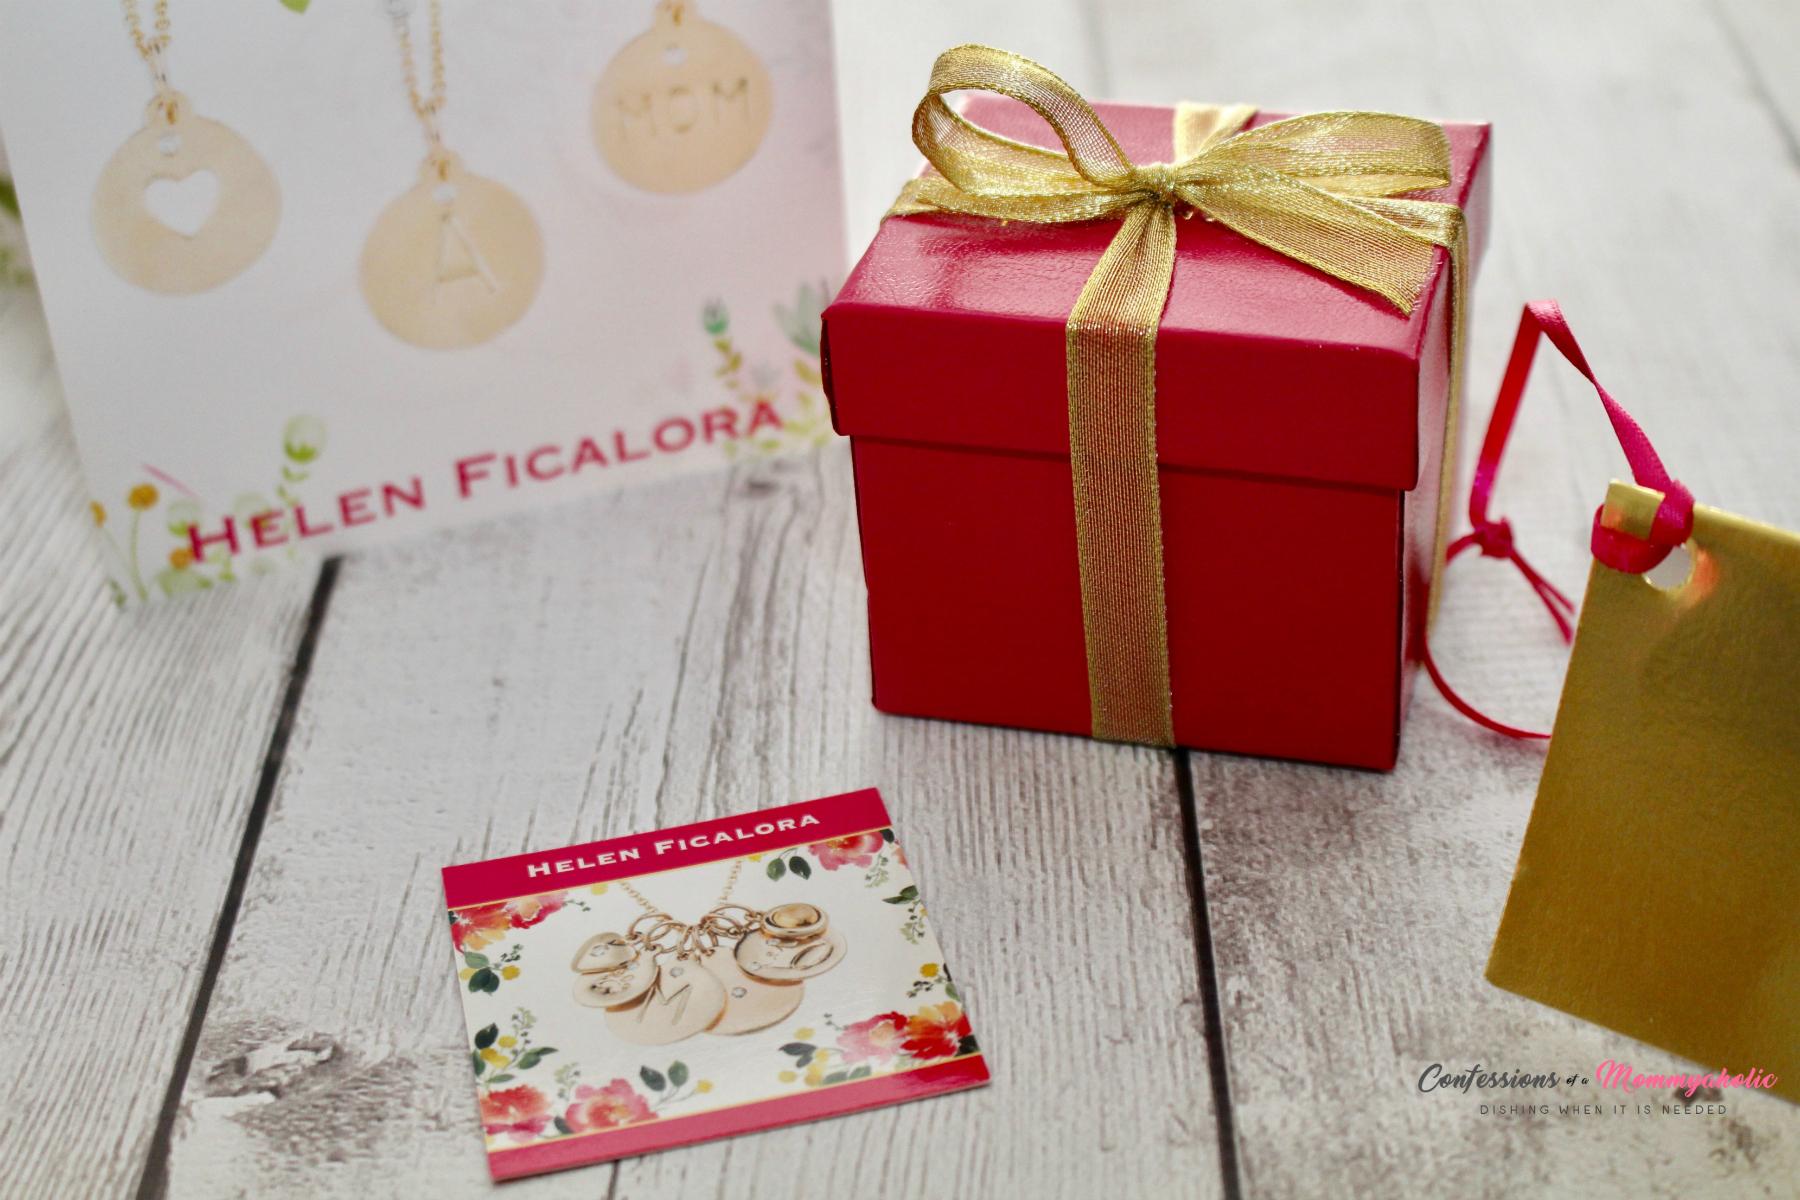 Helen Ficalora Pink Box and Card